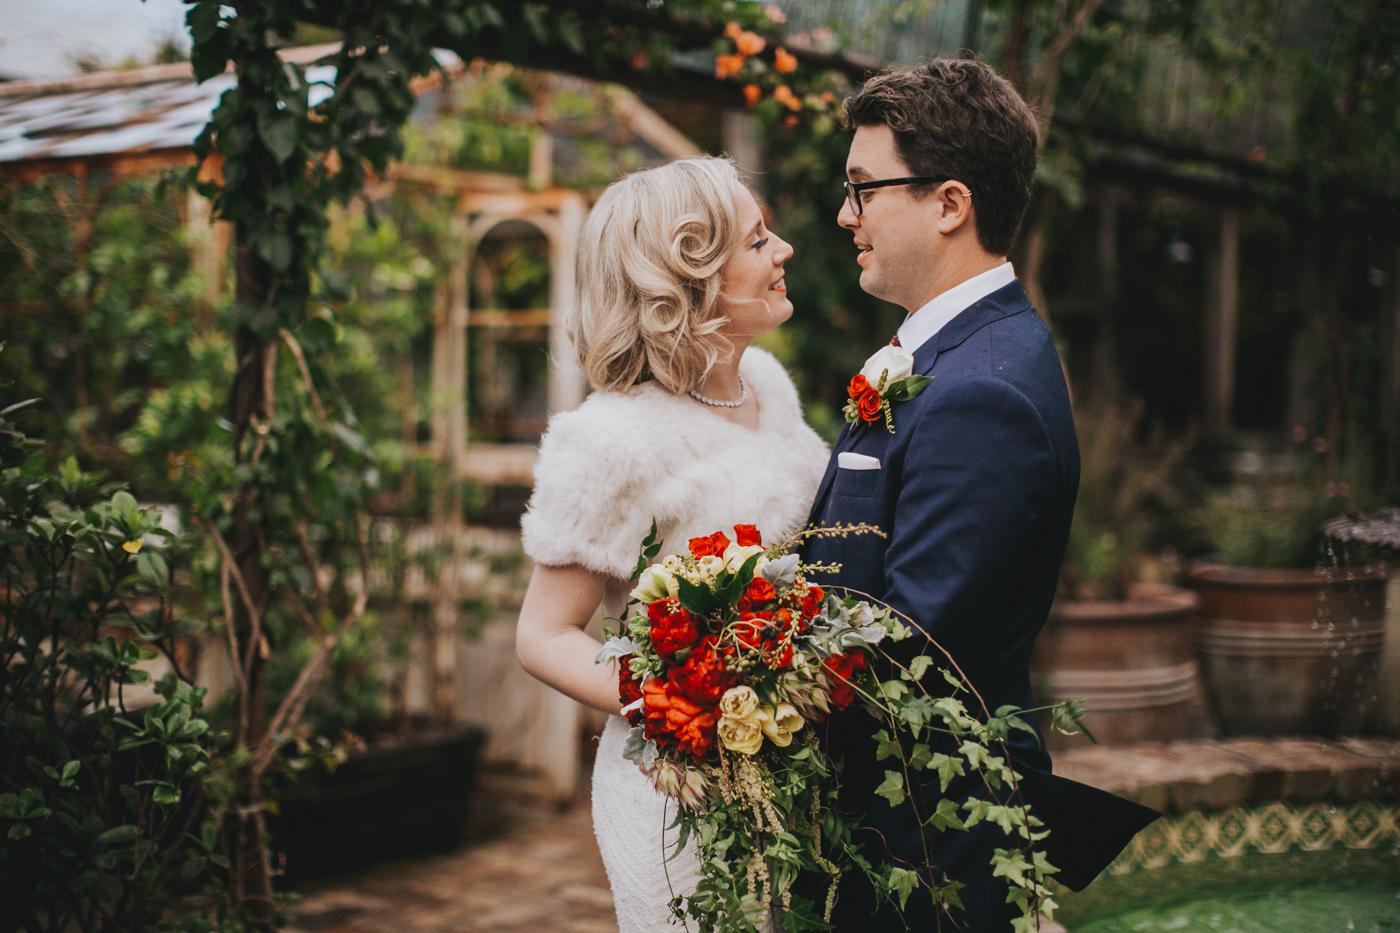 Jo & Tom Wedding - The Grounds of Alexandria - Samantha Heather Photography-211.jpg